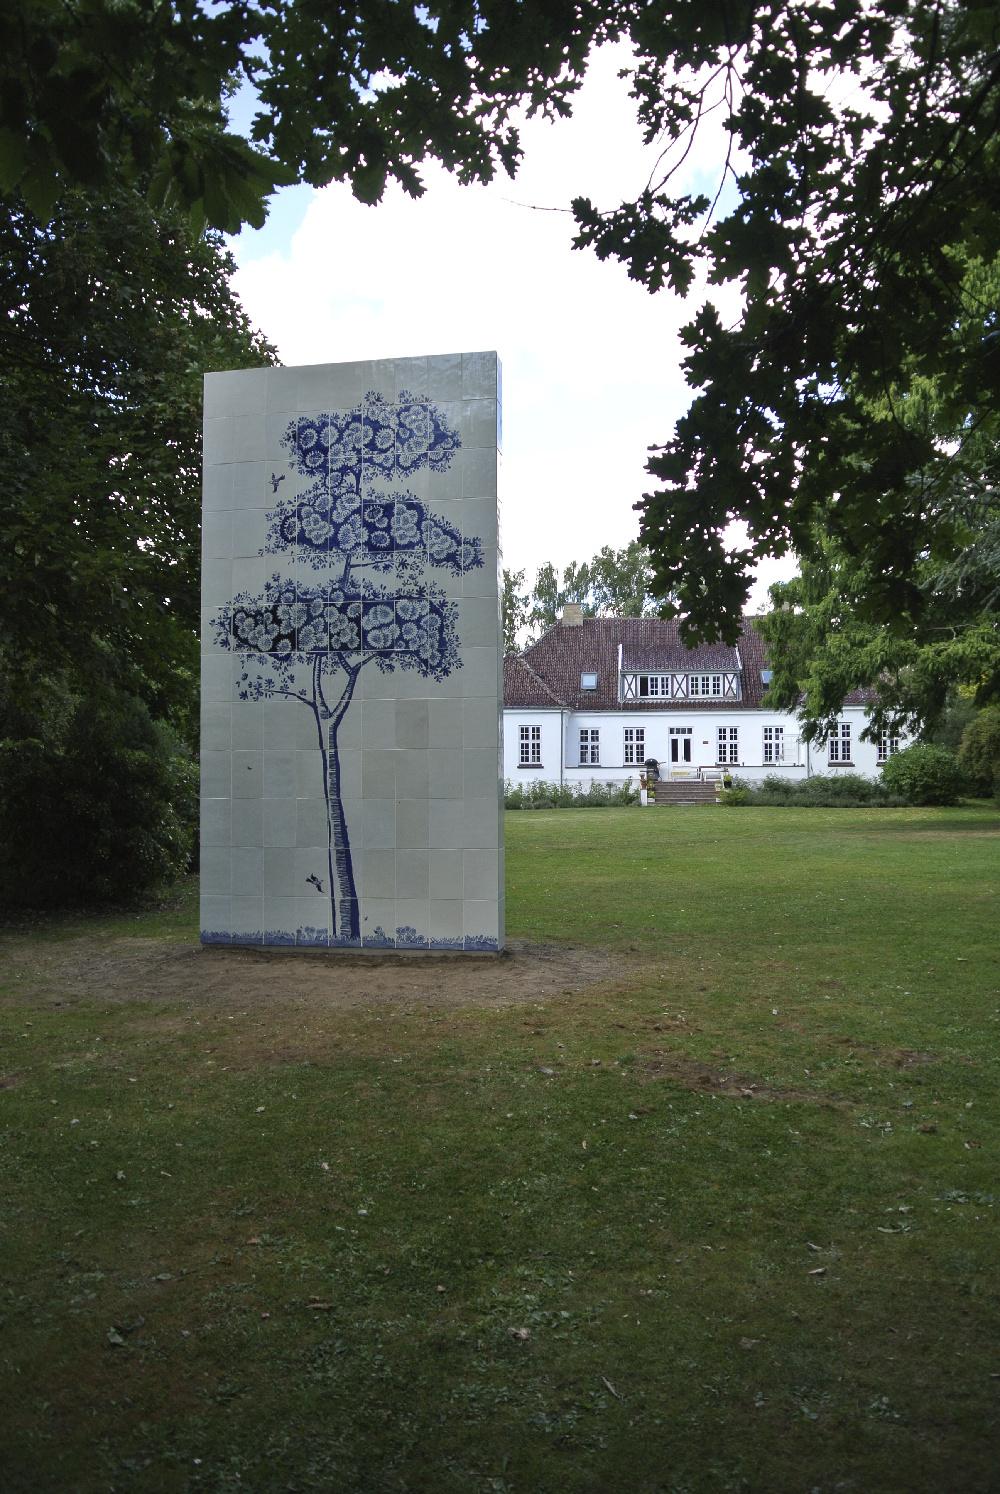 The Guldagergård Tree (after Spode) 3